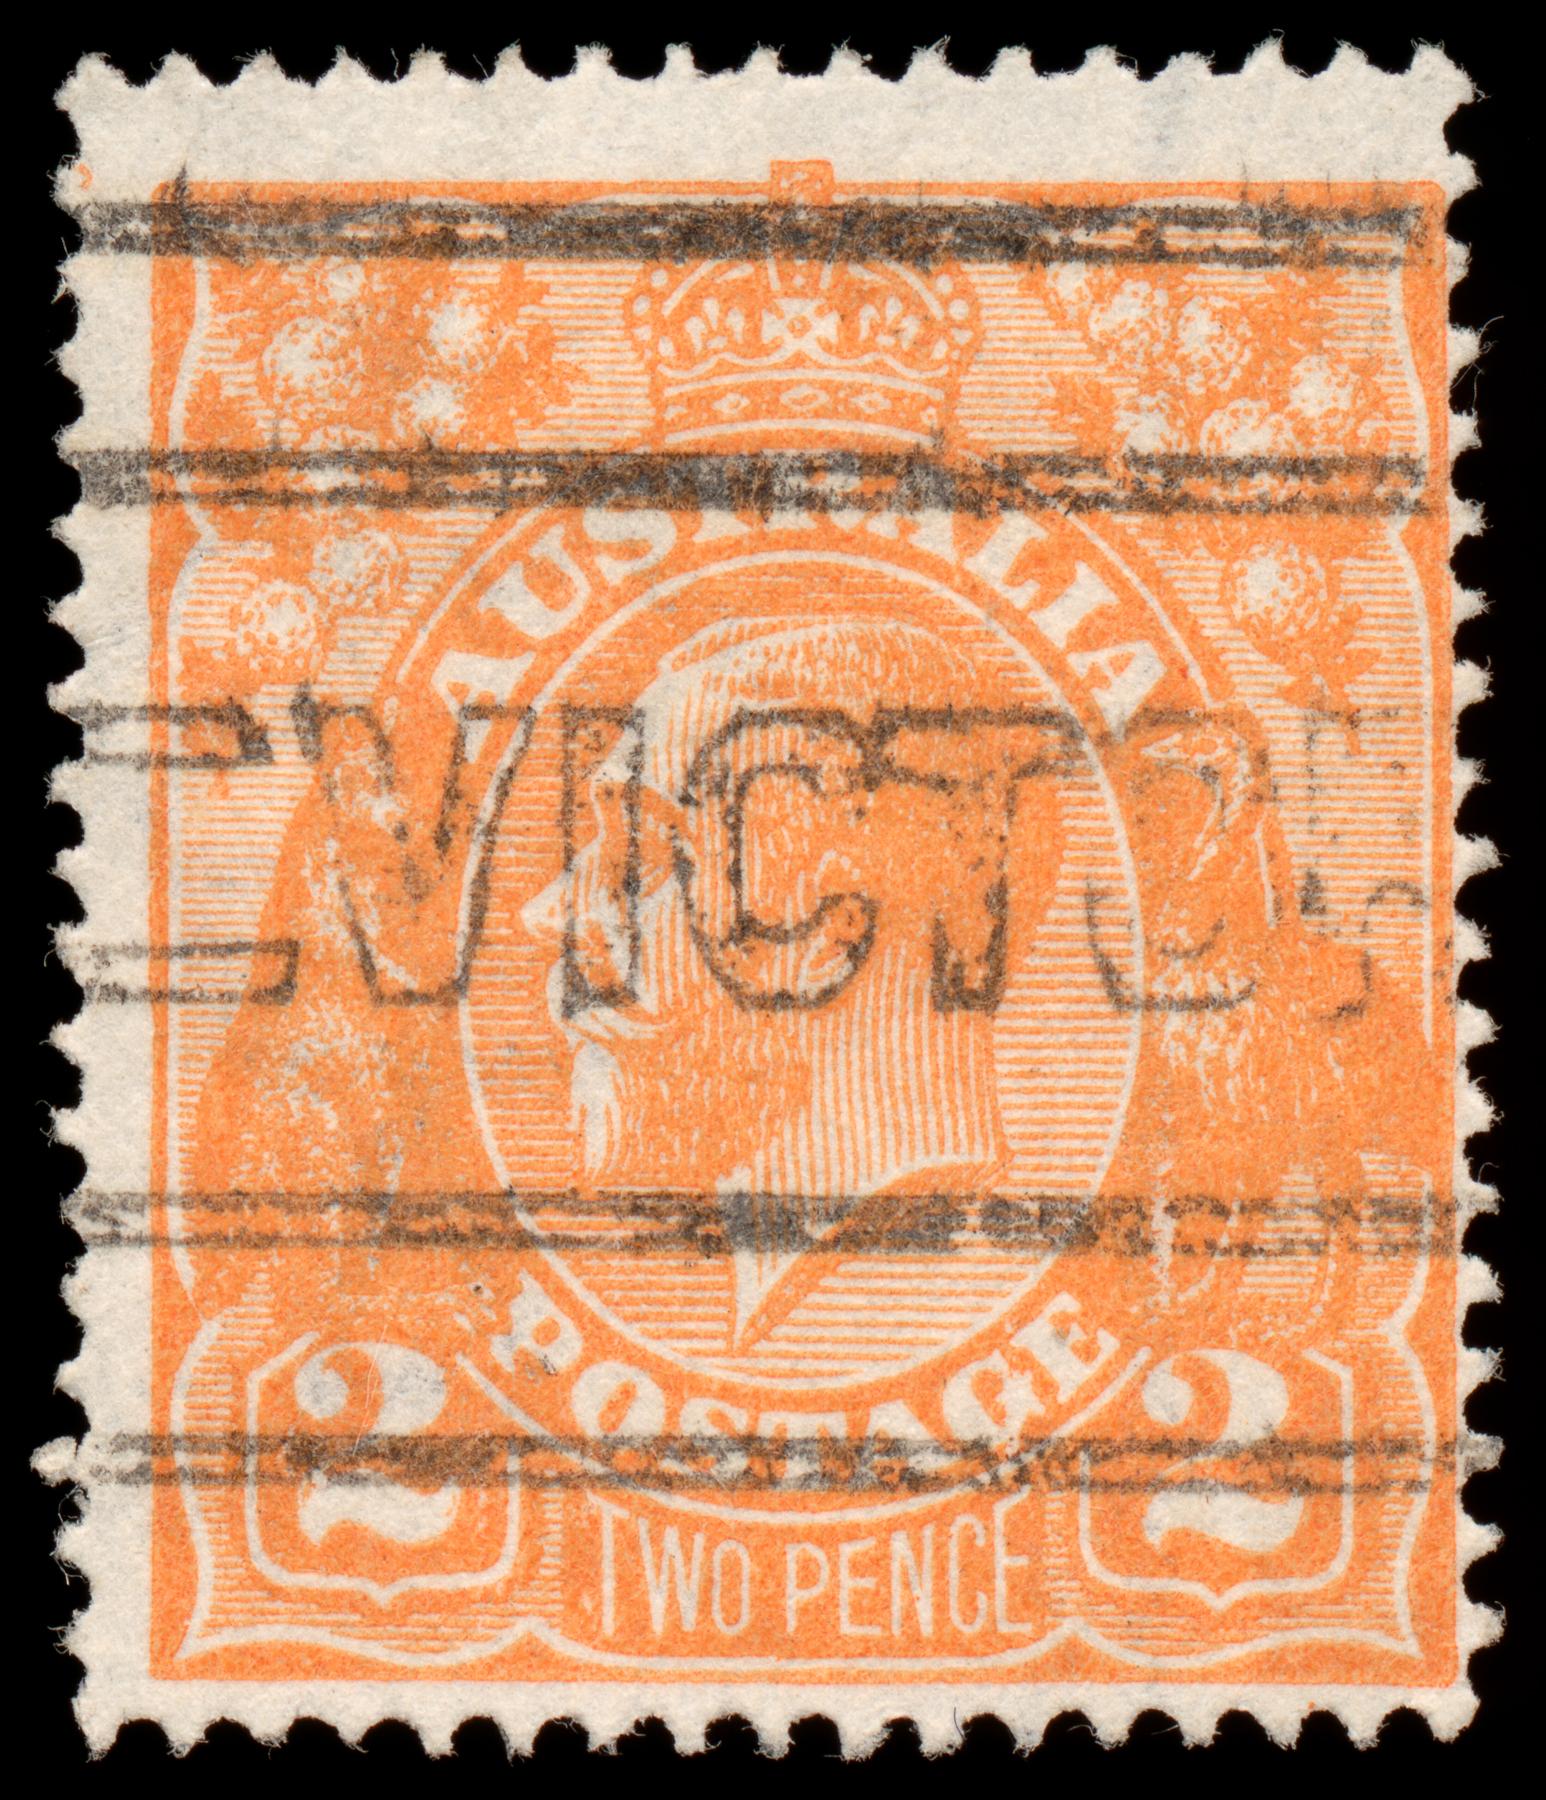 Orange king george v stamp photo